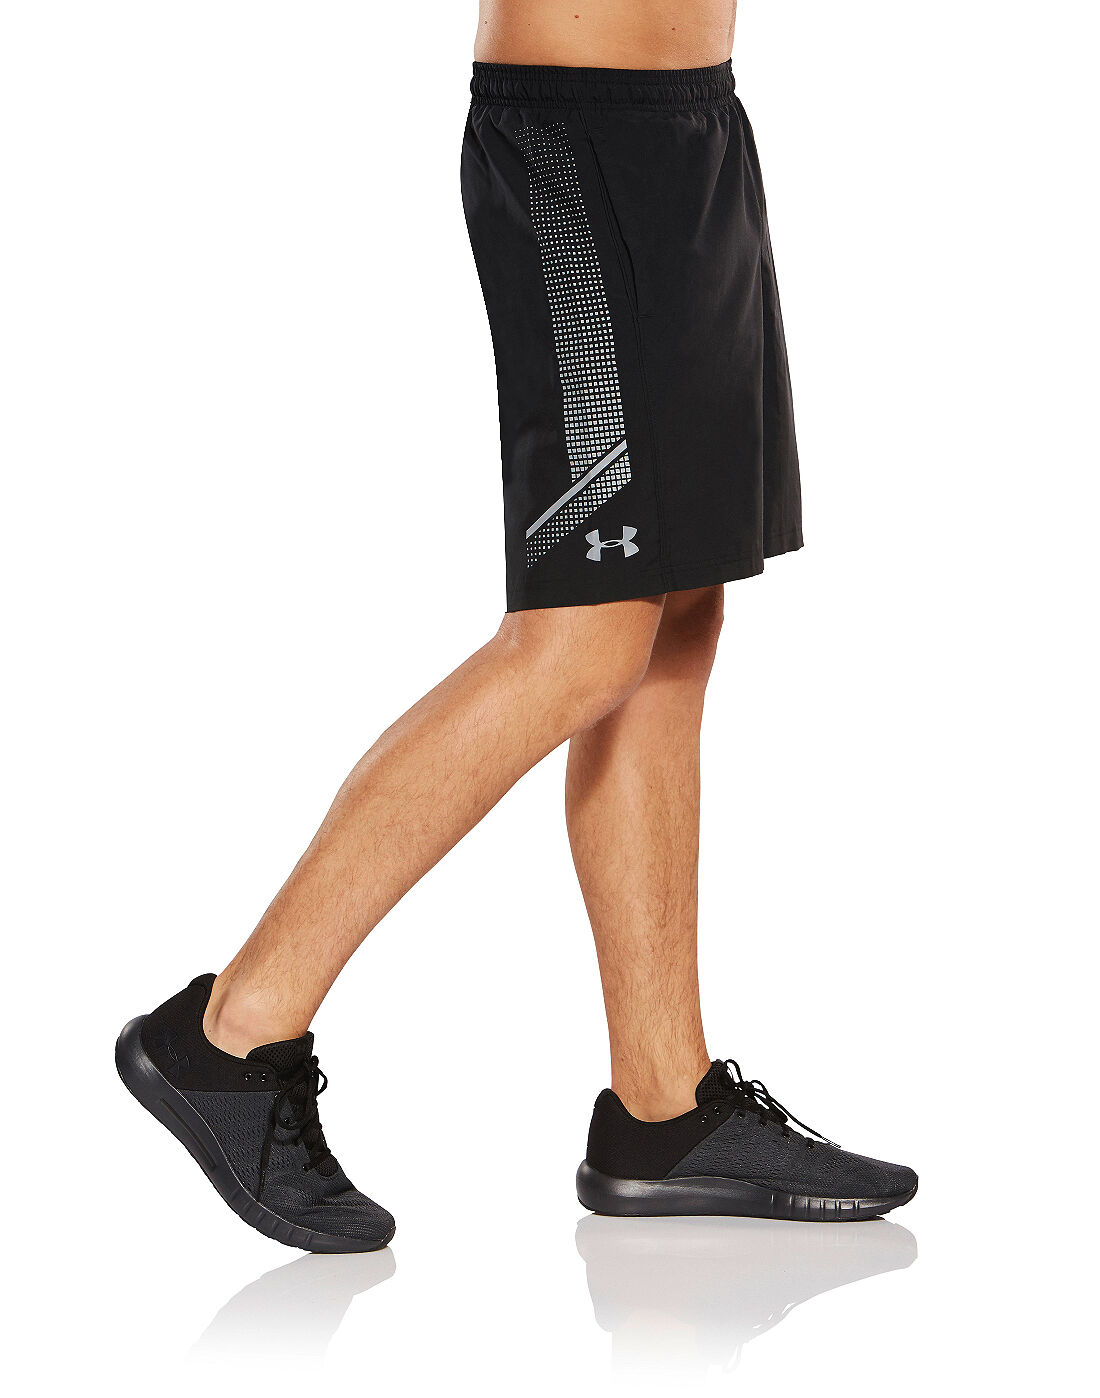 Men's Fitness & Running Shorts | Life Style Shorts